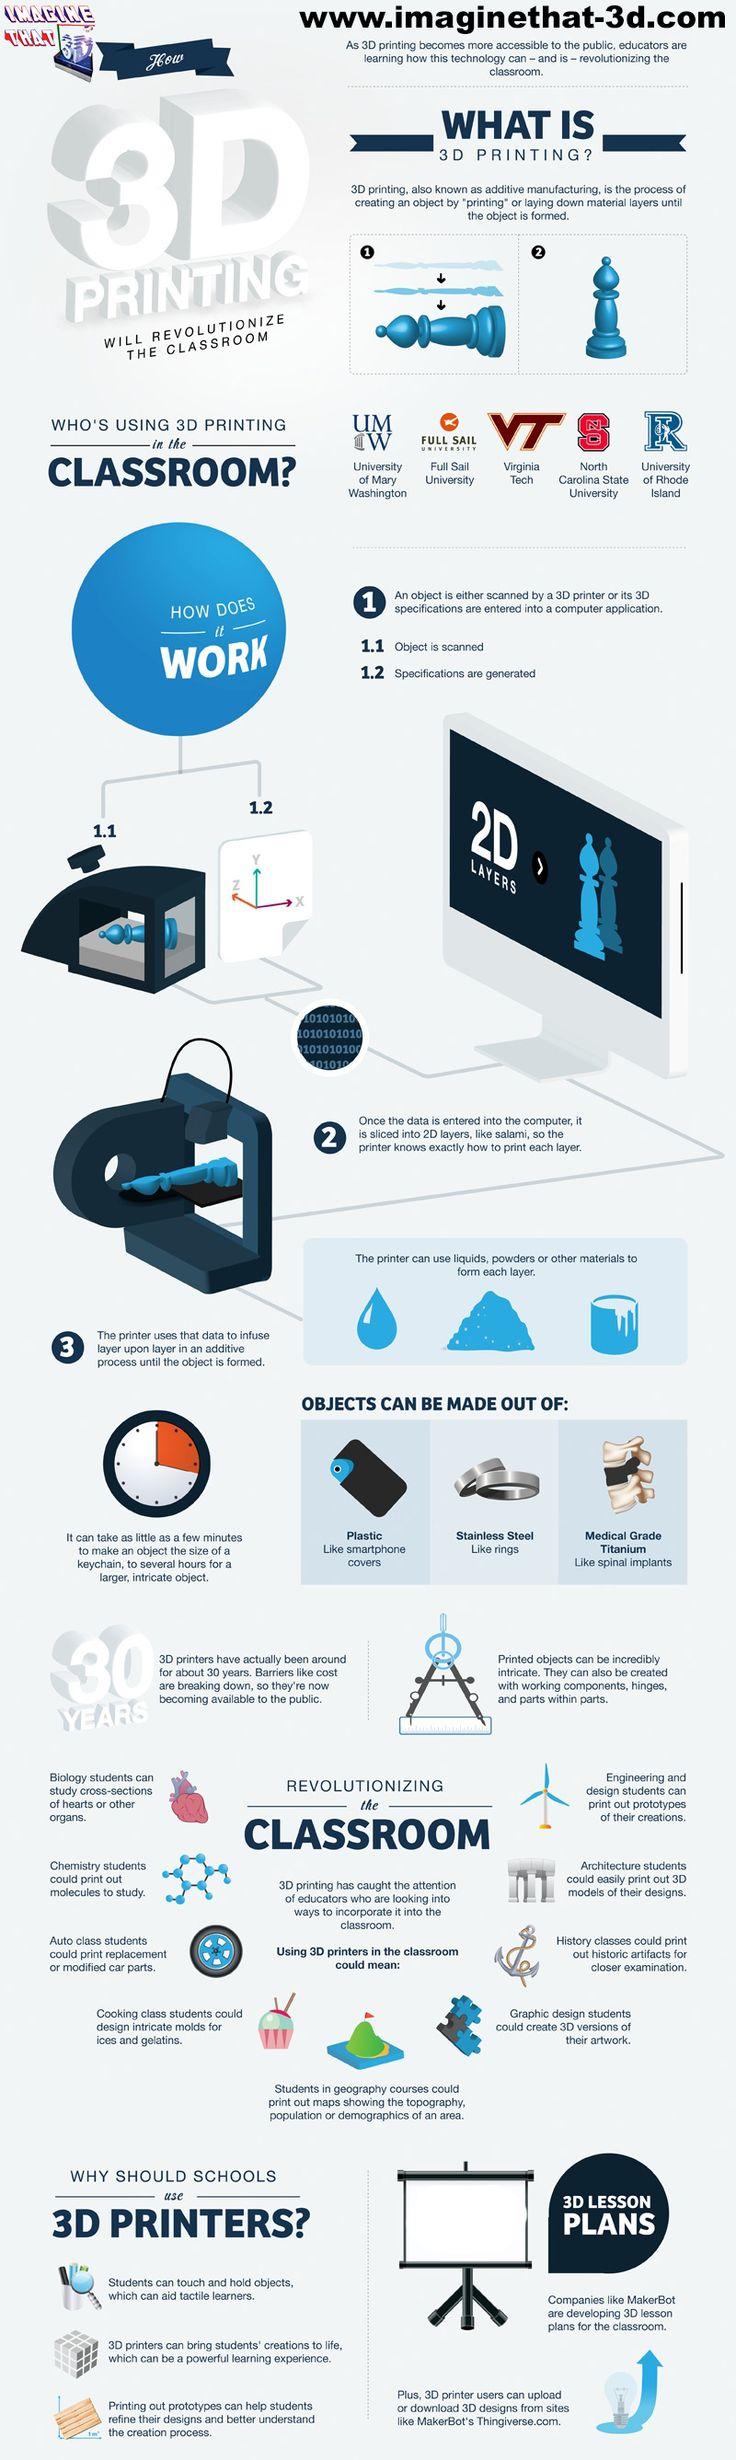 Will 3D Printing Revolutionize The Classroom